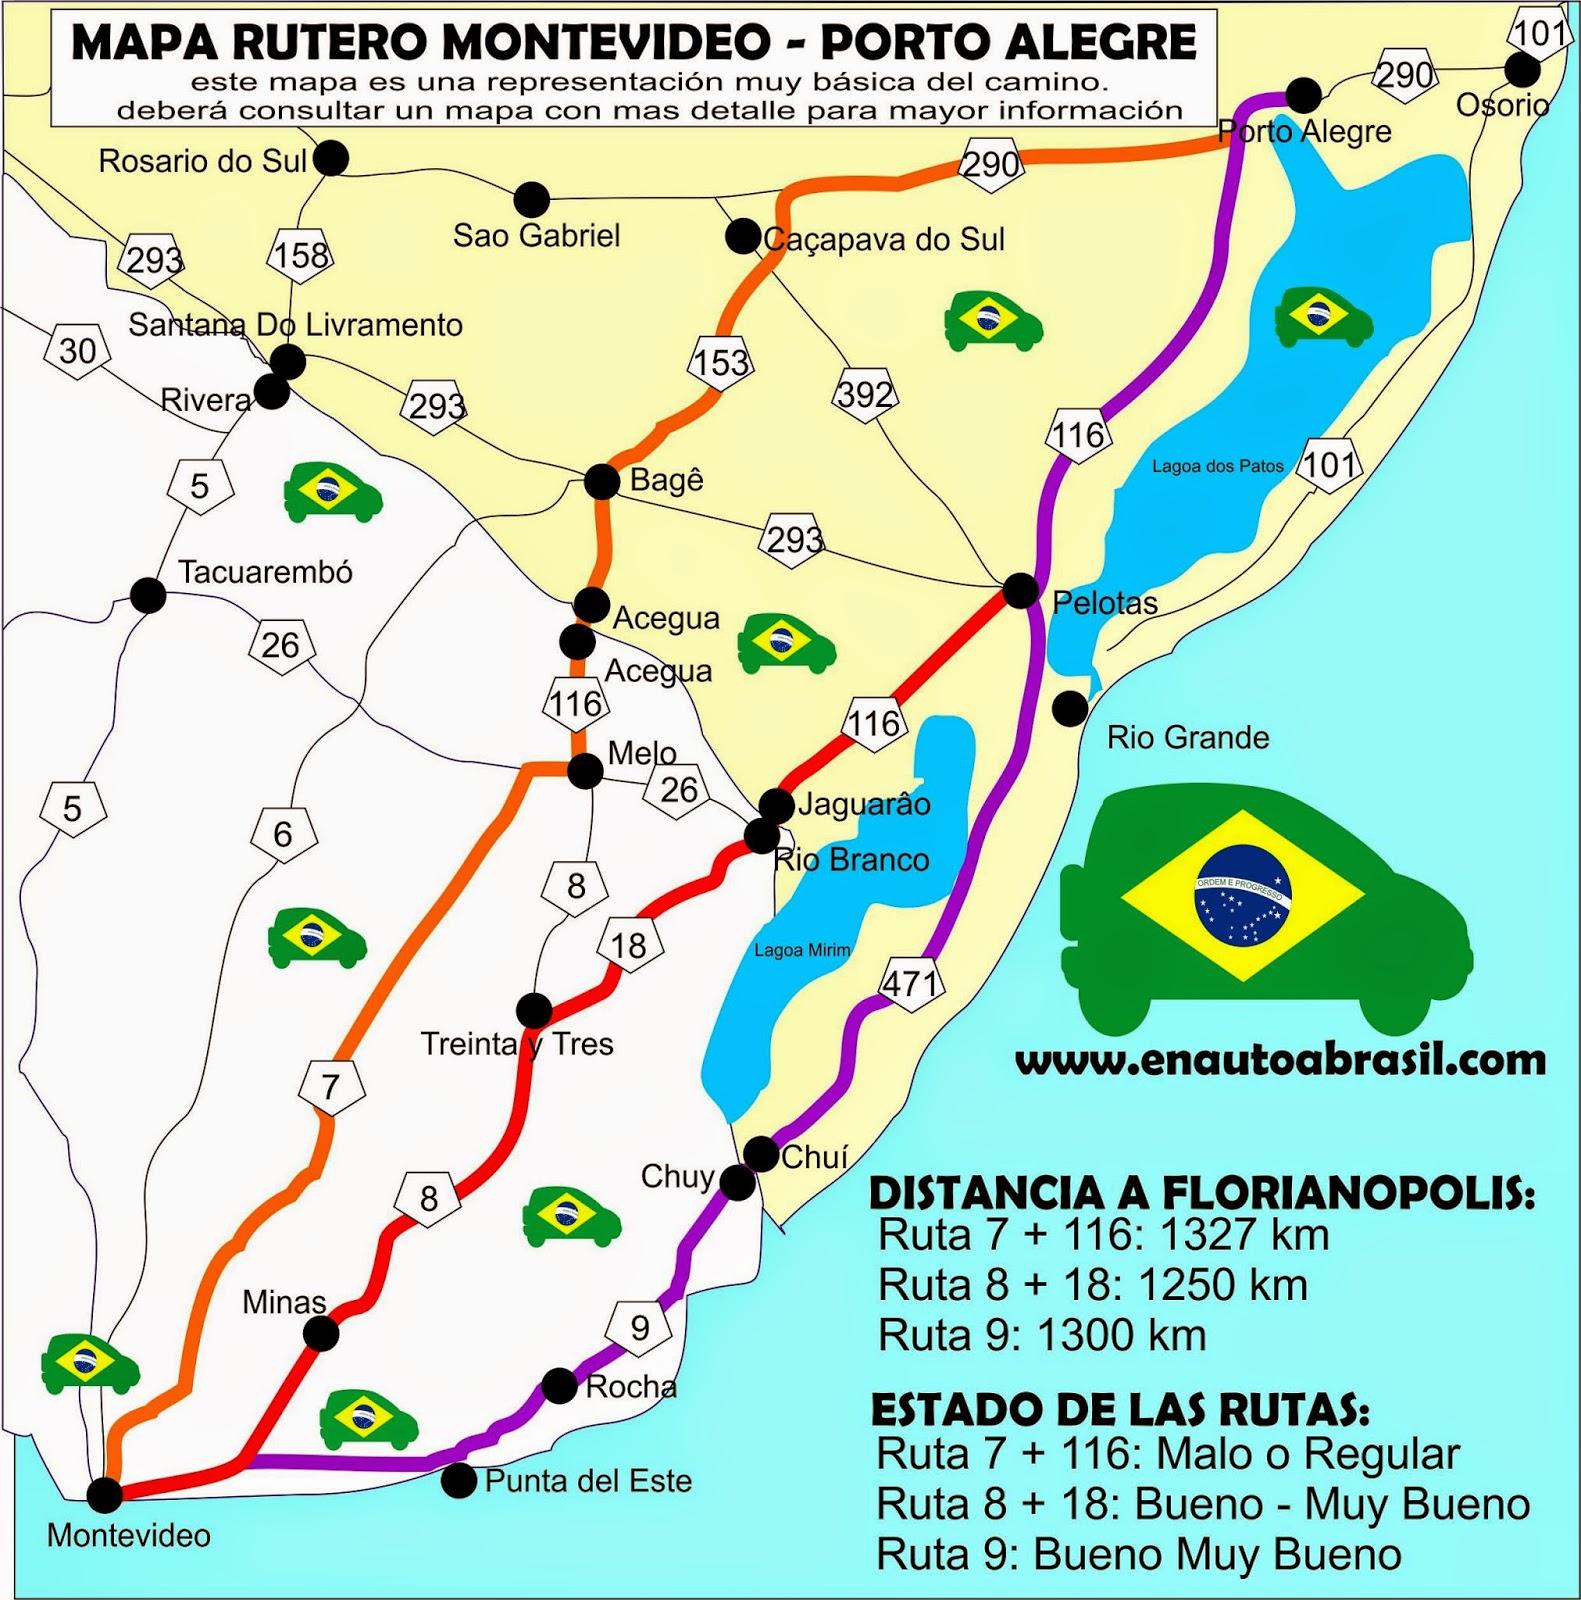 Mapa Montevideo a Florianopolis